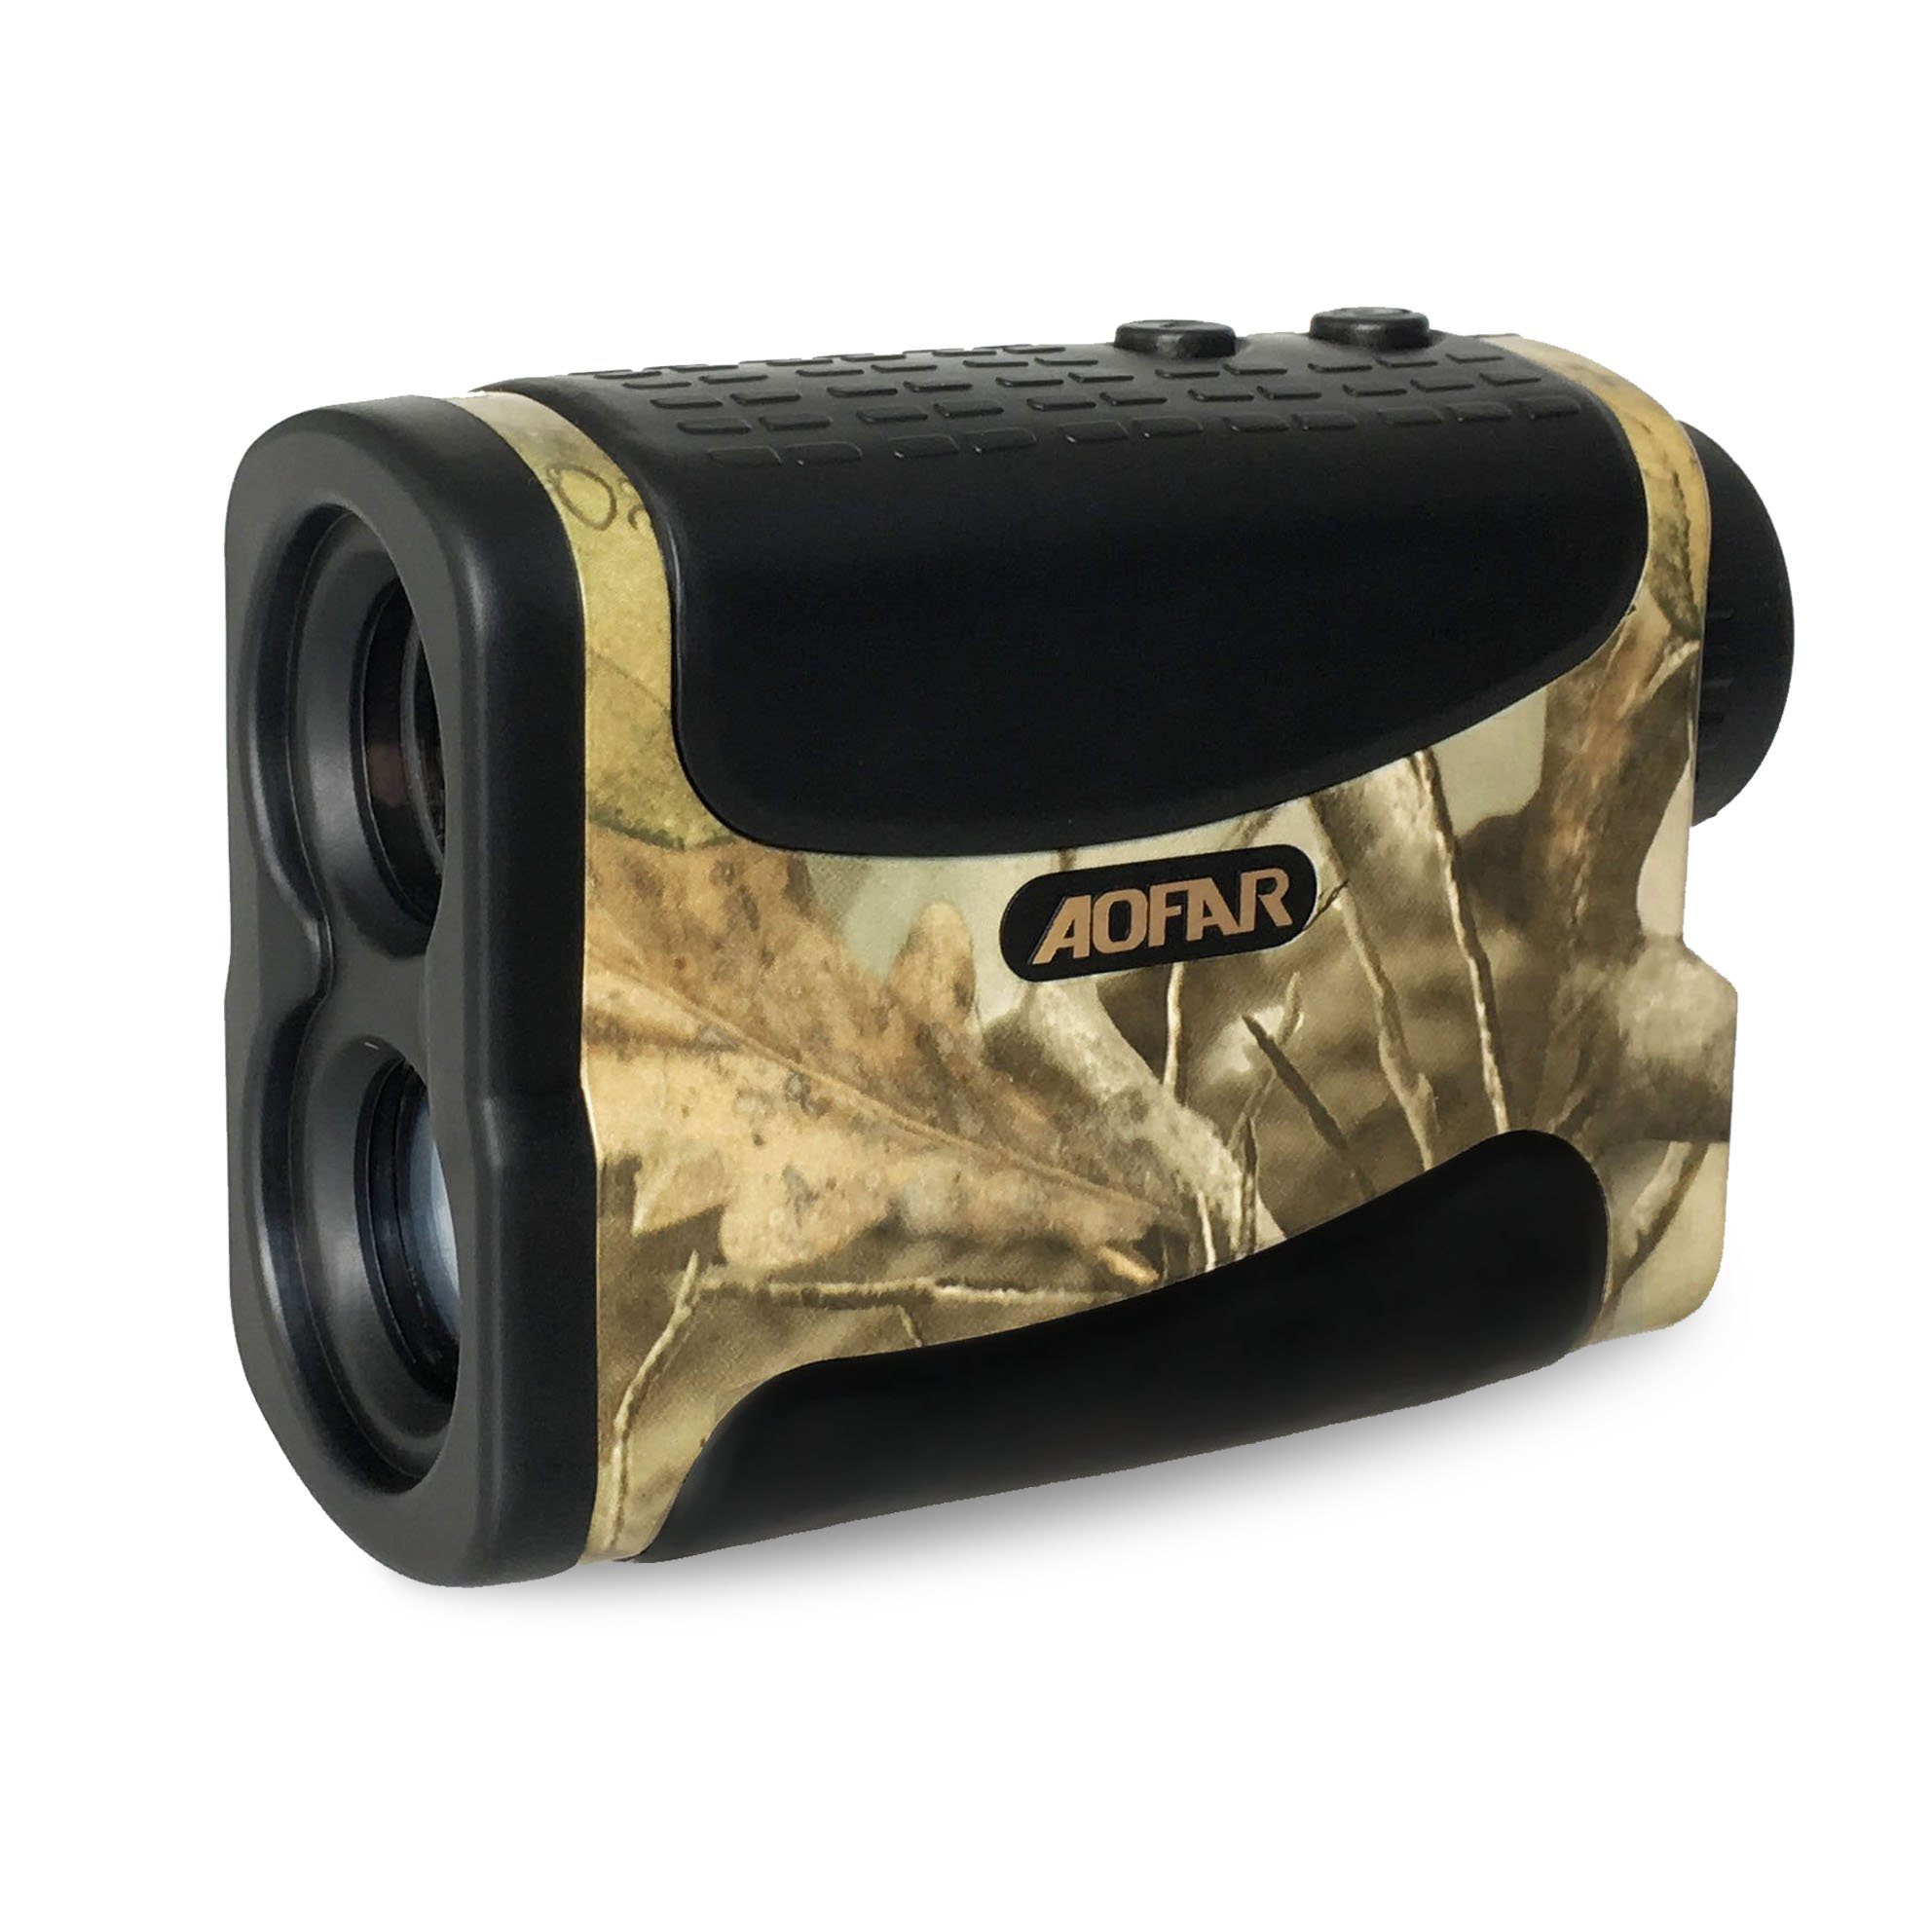 AOFAR Range Finder 1000 Yards Waterproof for Hunting Golf, 6X 25mm Measurer Laser Rangefinder with Speed Scan and Fog, Free Battery